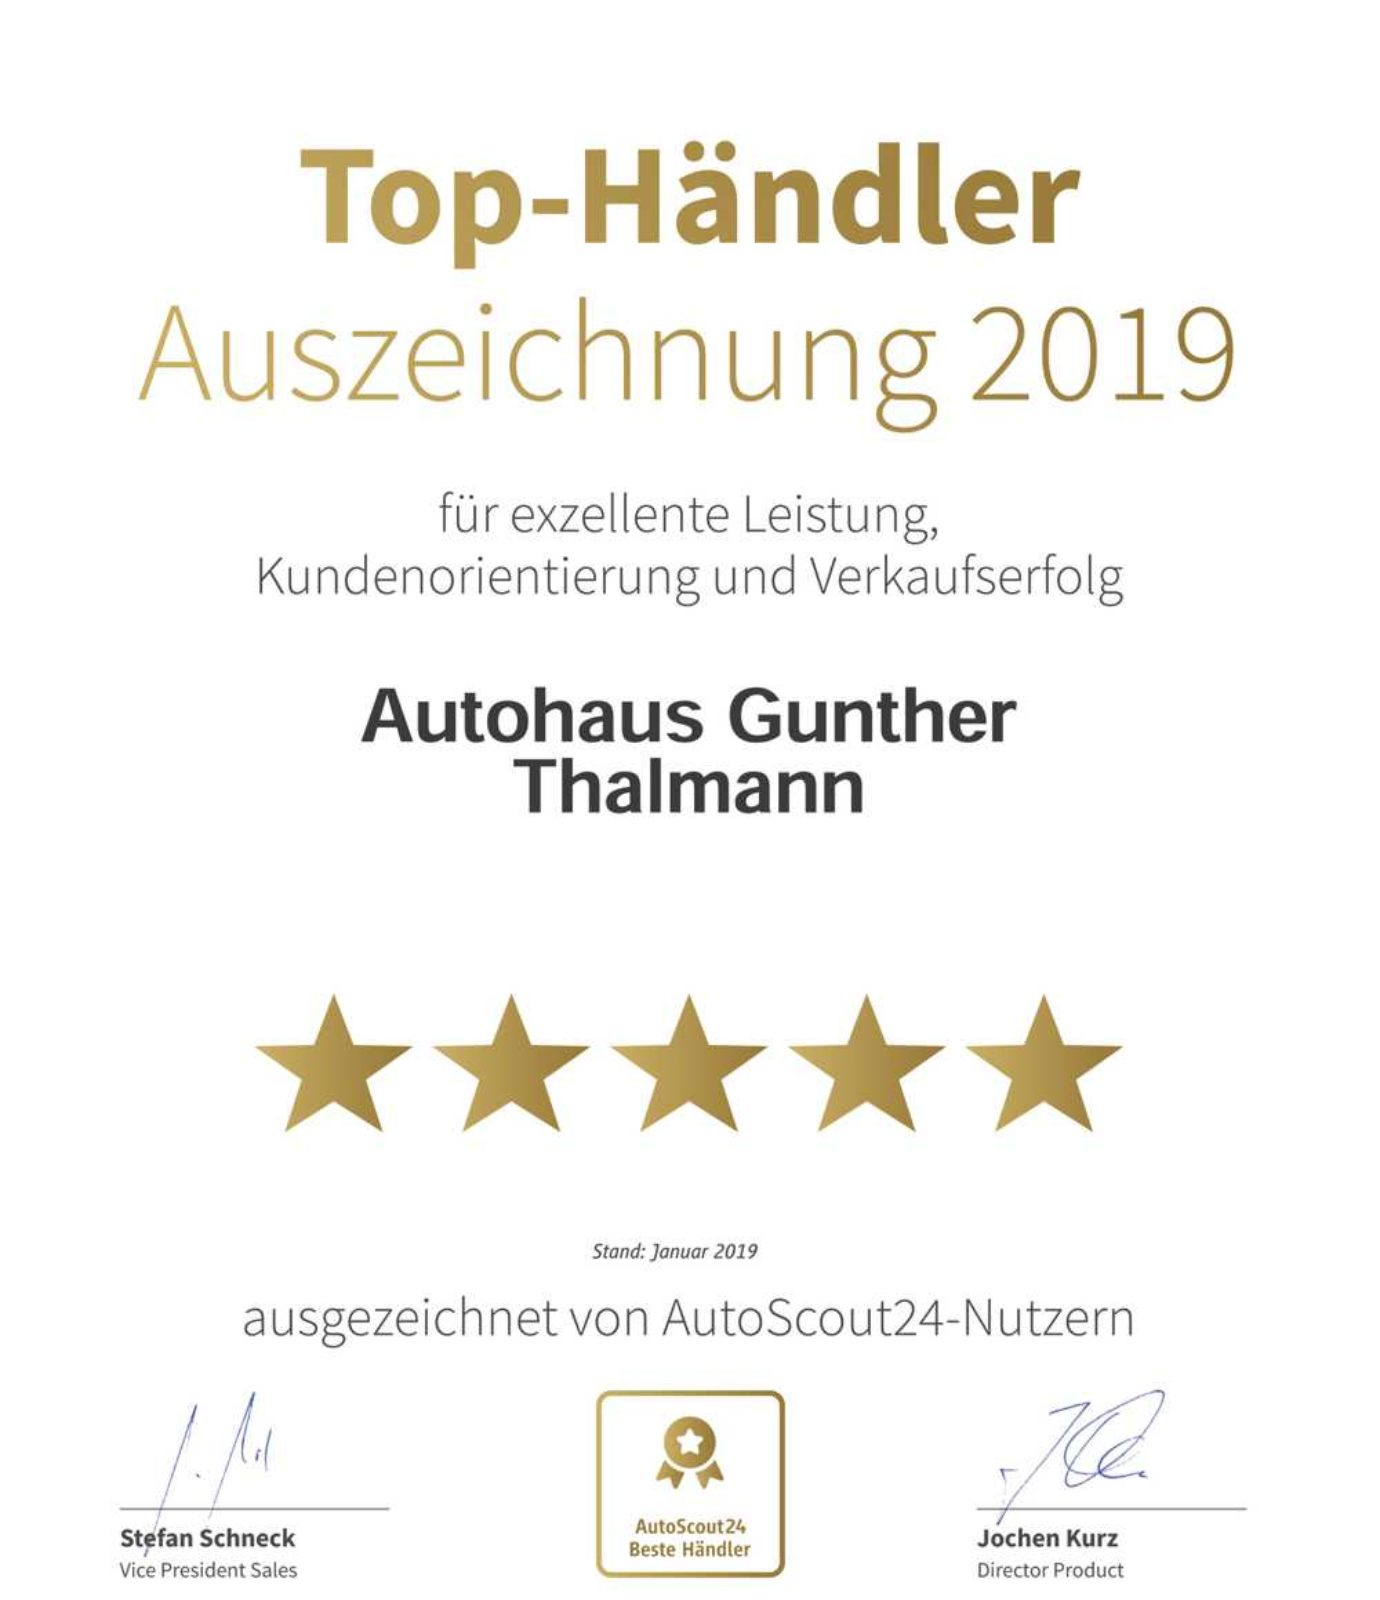 Top-Haendler-2019_AH-Thalmann_AutoScout24